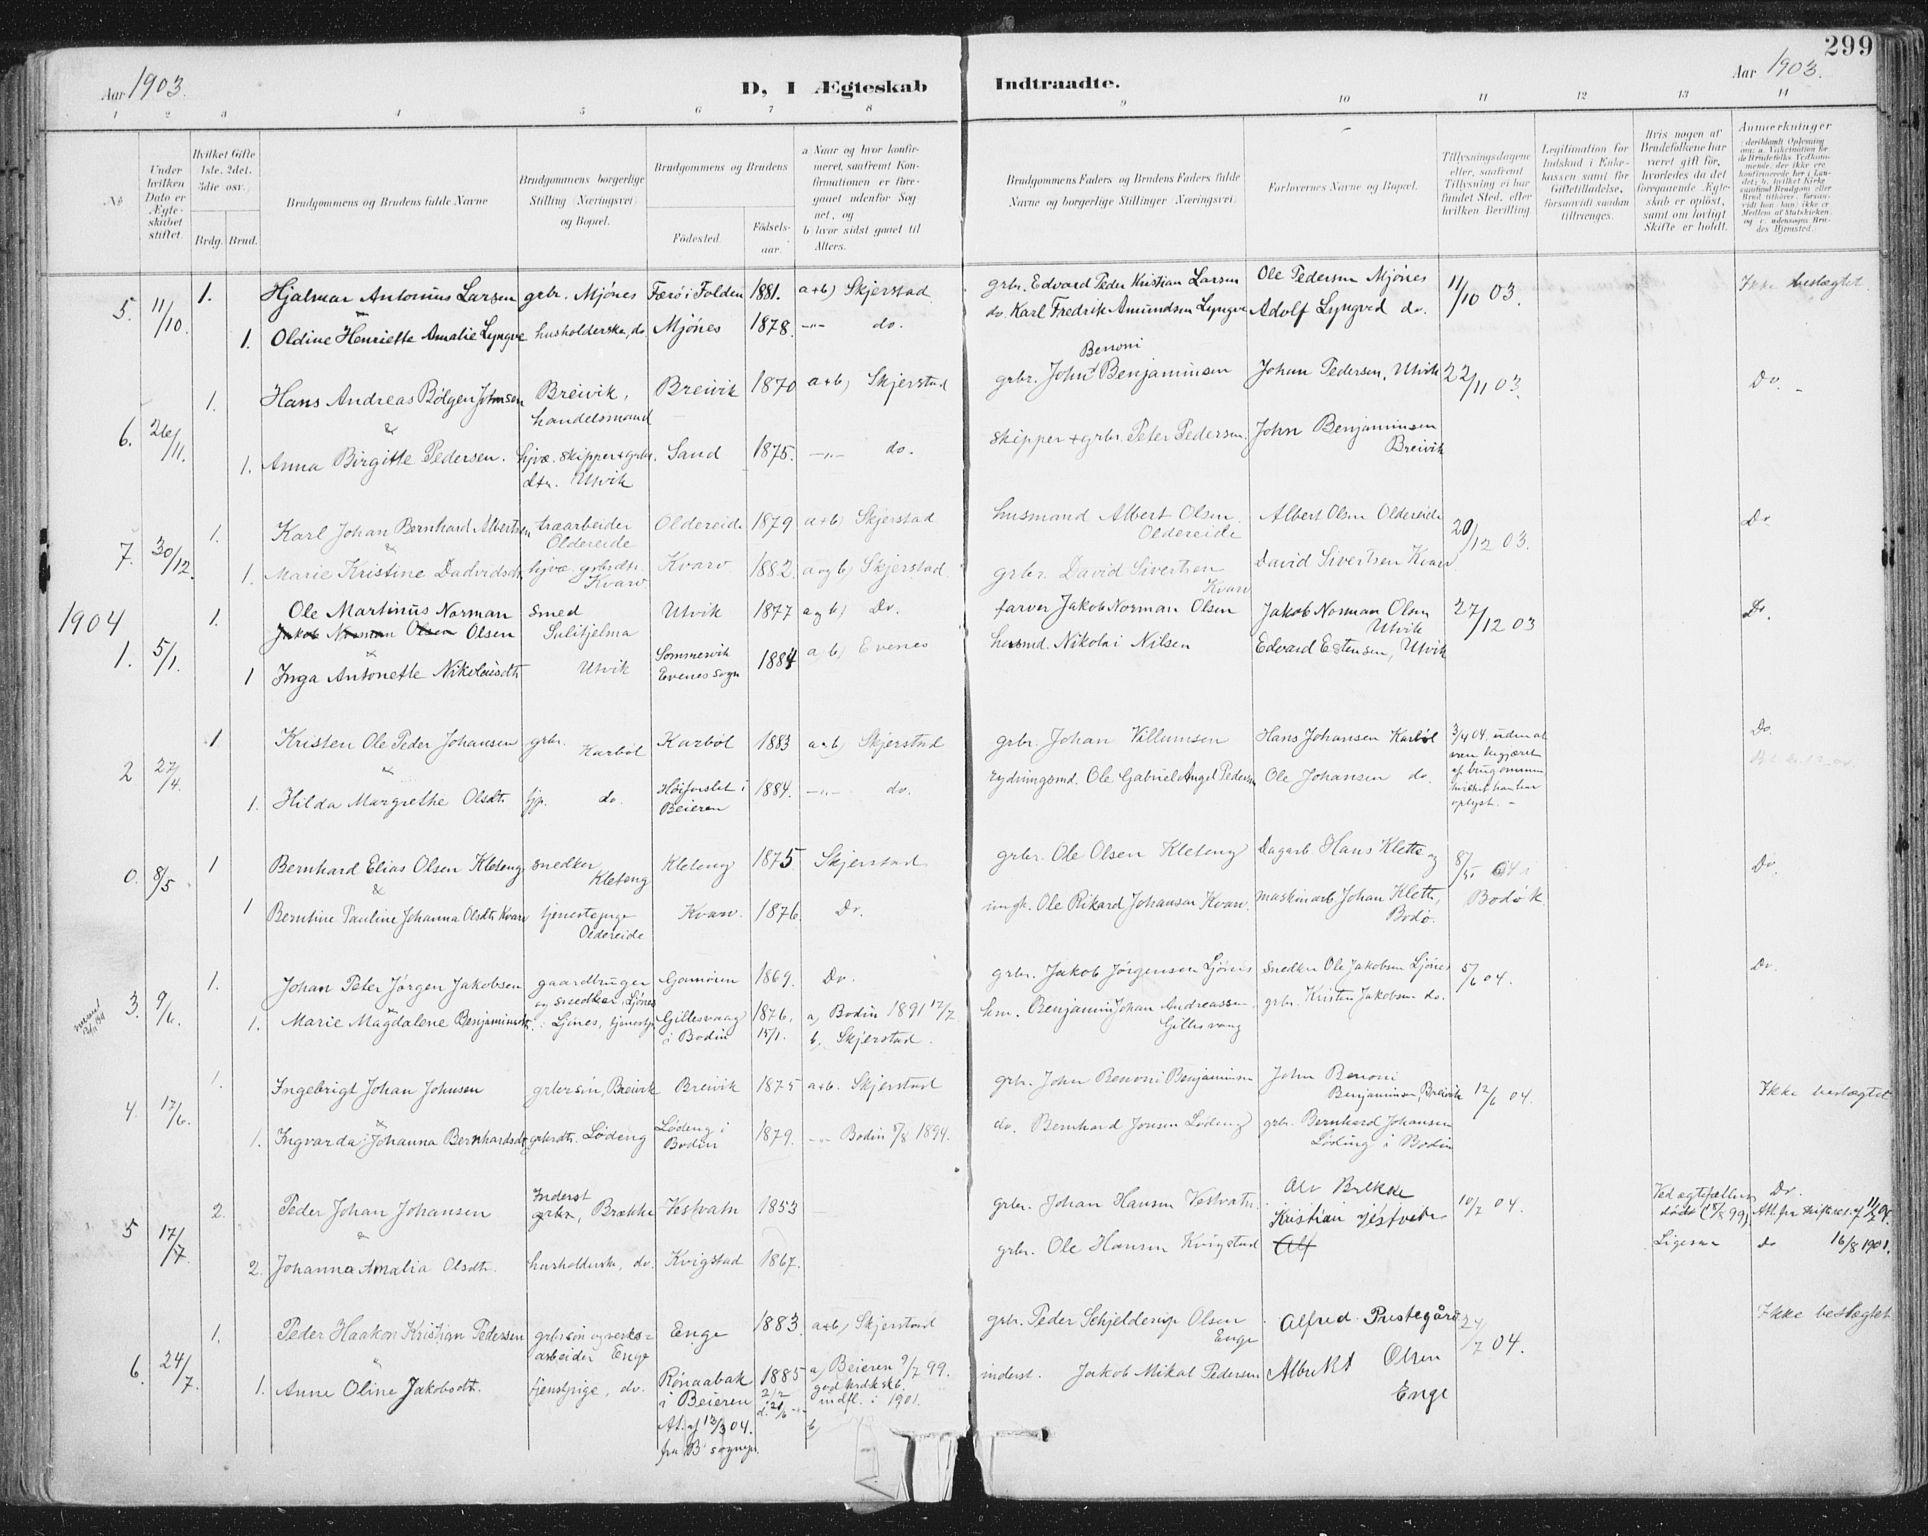 SAT, Ministerialprotokoller, klokkerbøker og fødselsregistre - Nordland, 852/L0741: Ministerialbok nr. 852A11, 1894-1917, s. 299